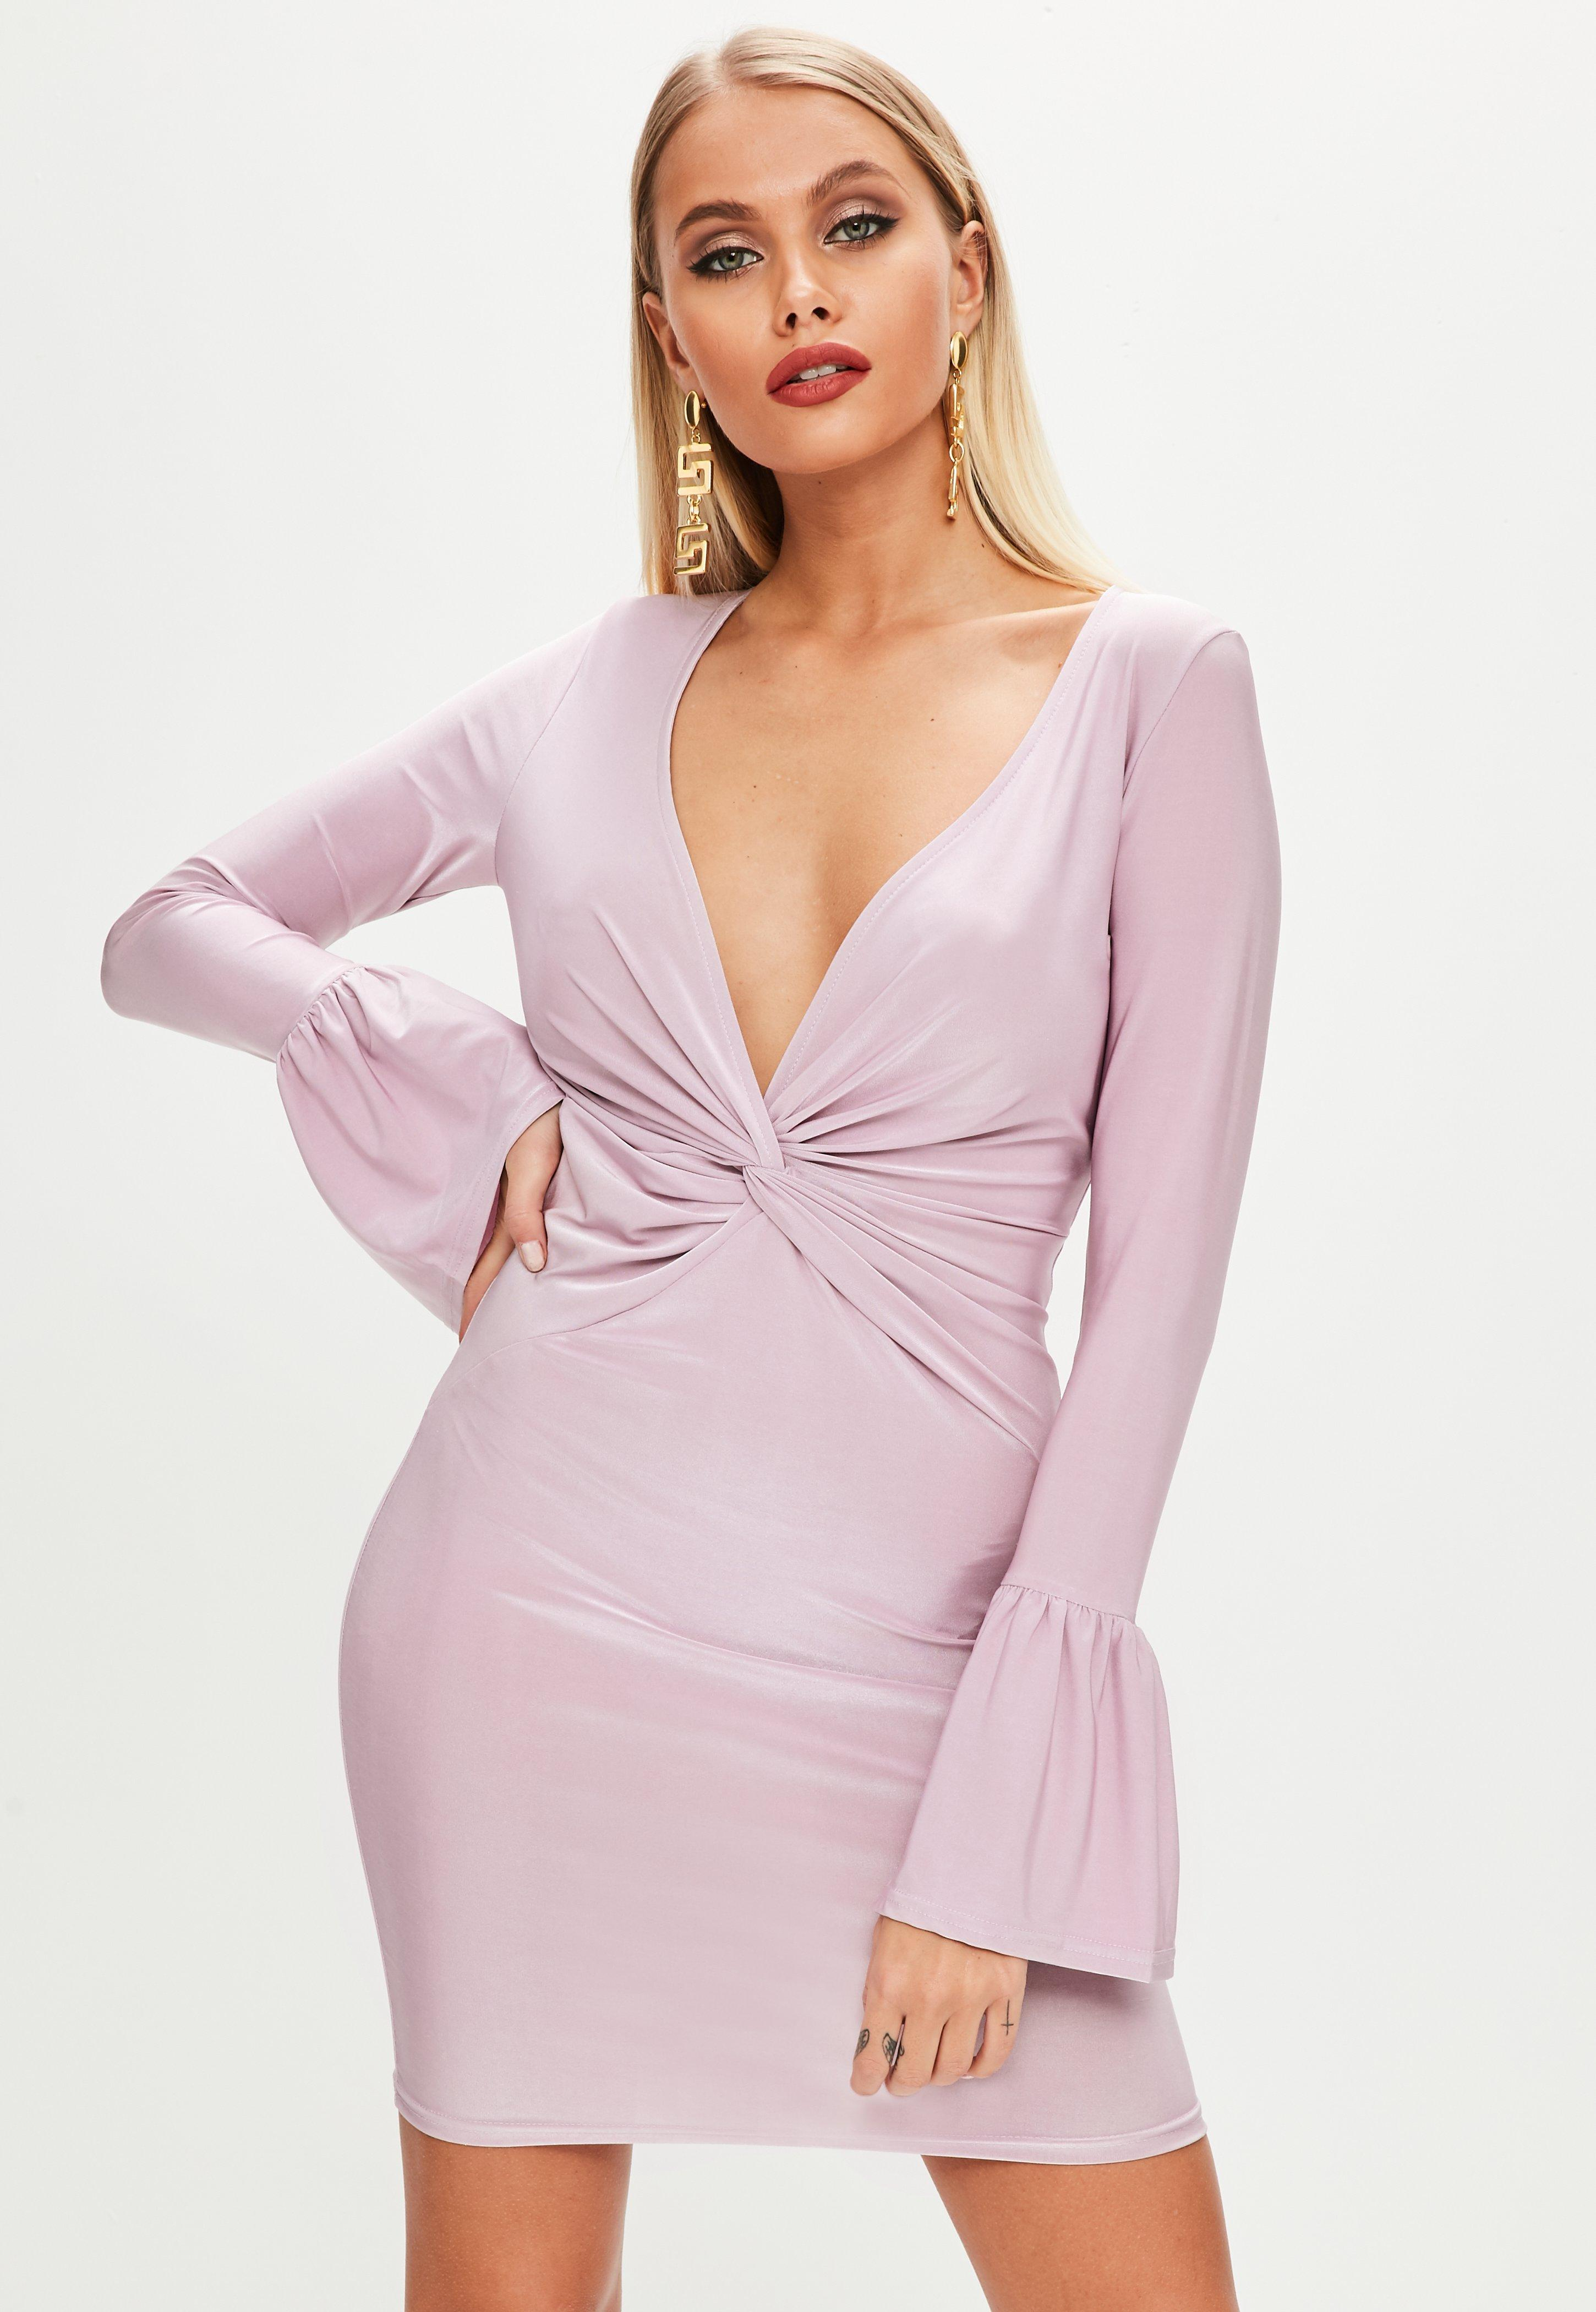 Lilac prom dresses uk cheap